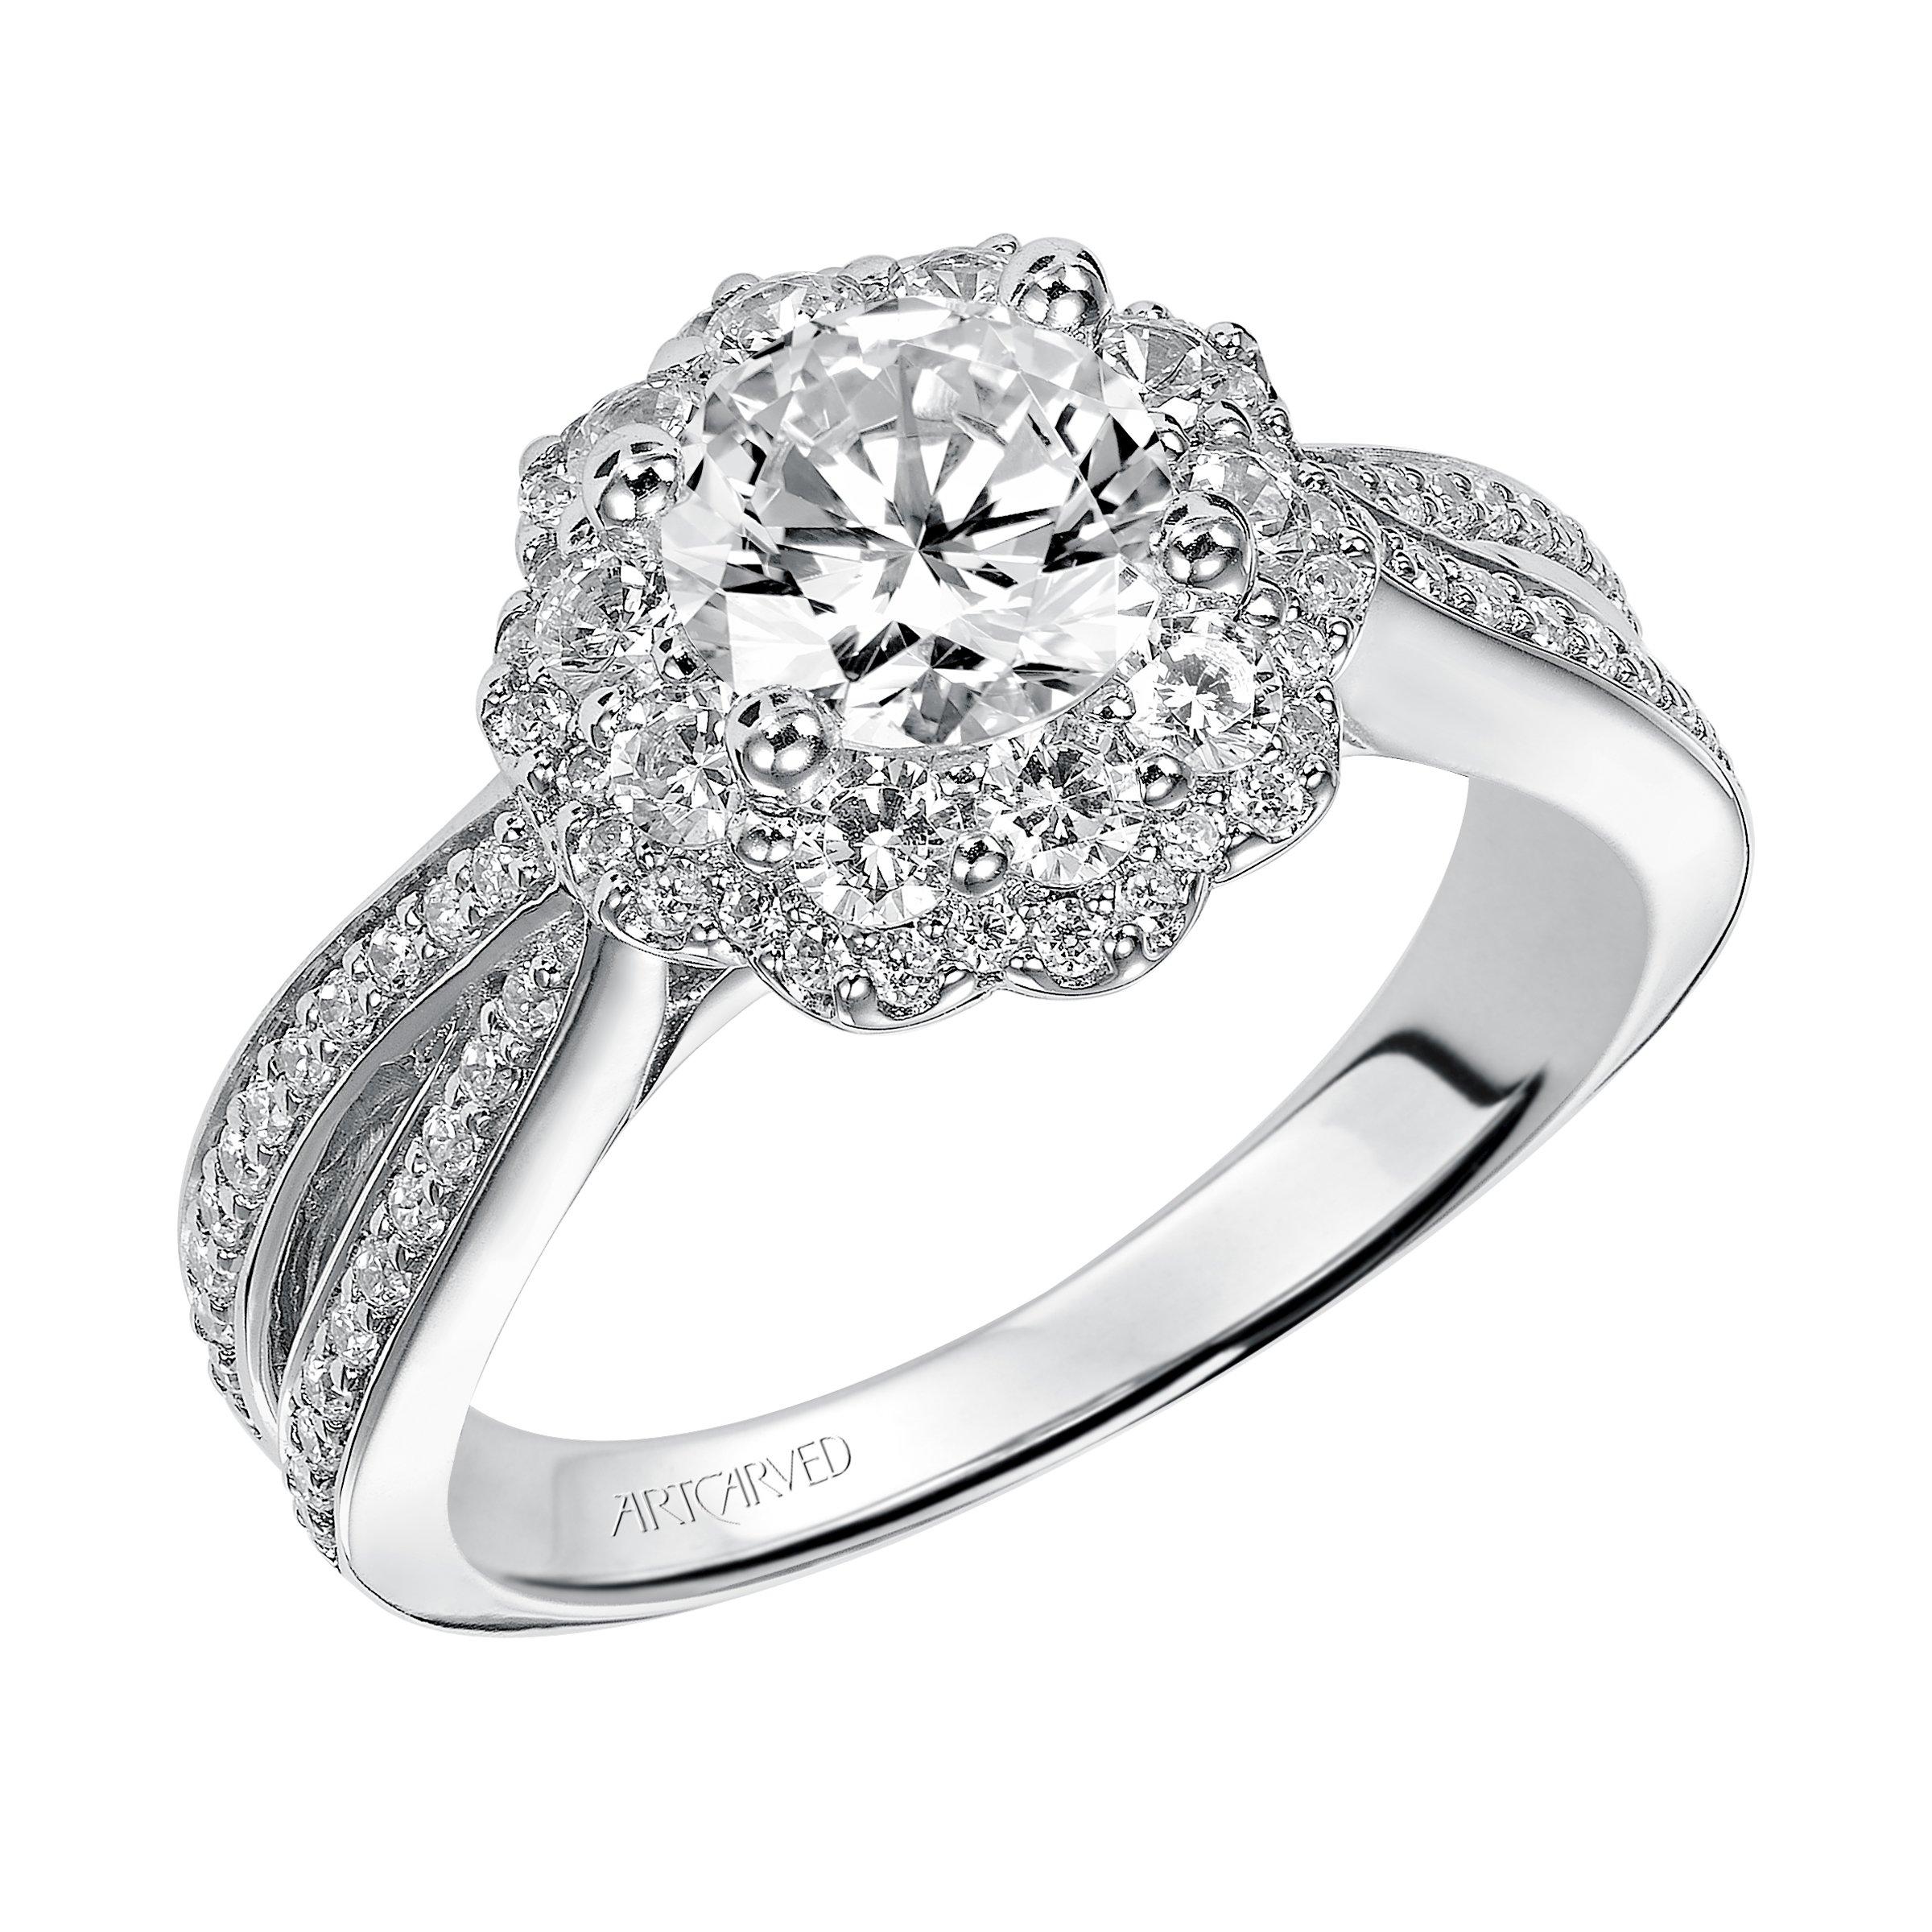 95c537c17ea ArtCarved Halo White Gold Diamond Engagement Ring. Designer ...